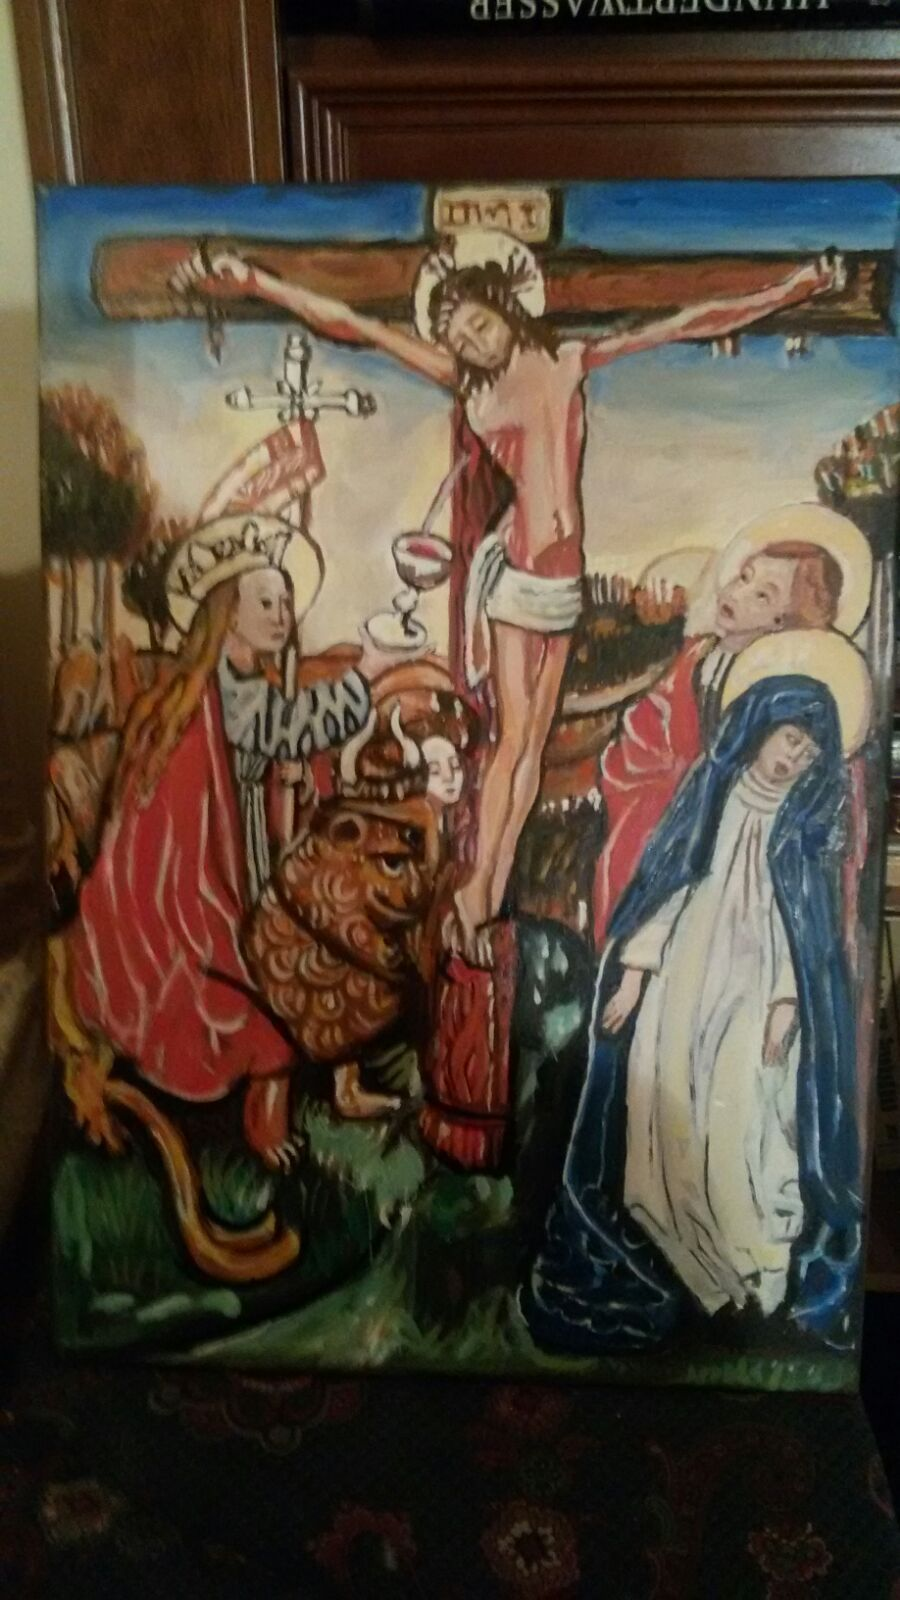 Indiana Jones Last Crusade Replica Crucifixion Holy Grail Oil Painting Indiana Jones Indiana Jones Last Crusade Painting